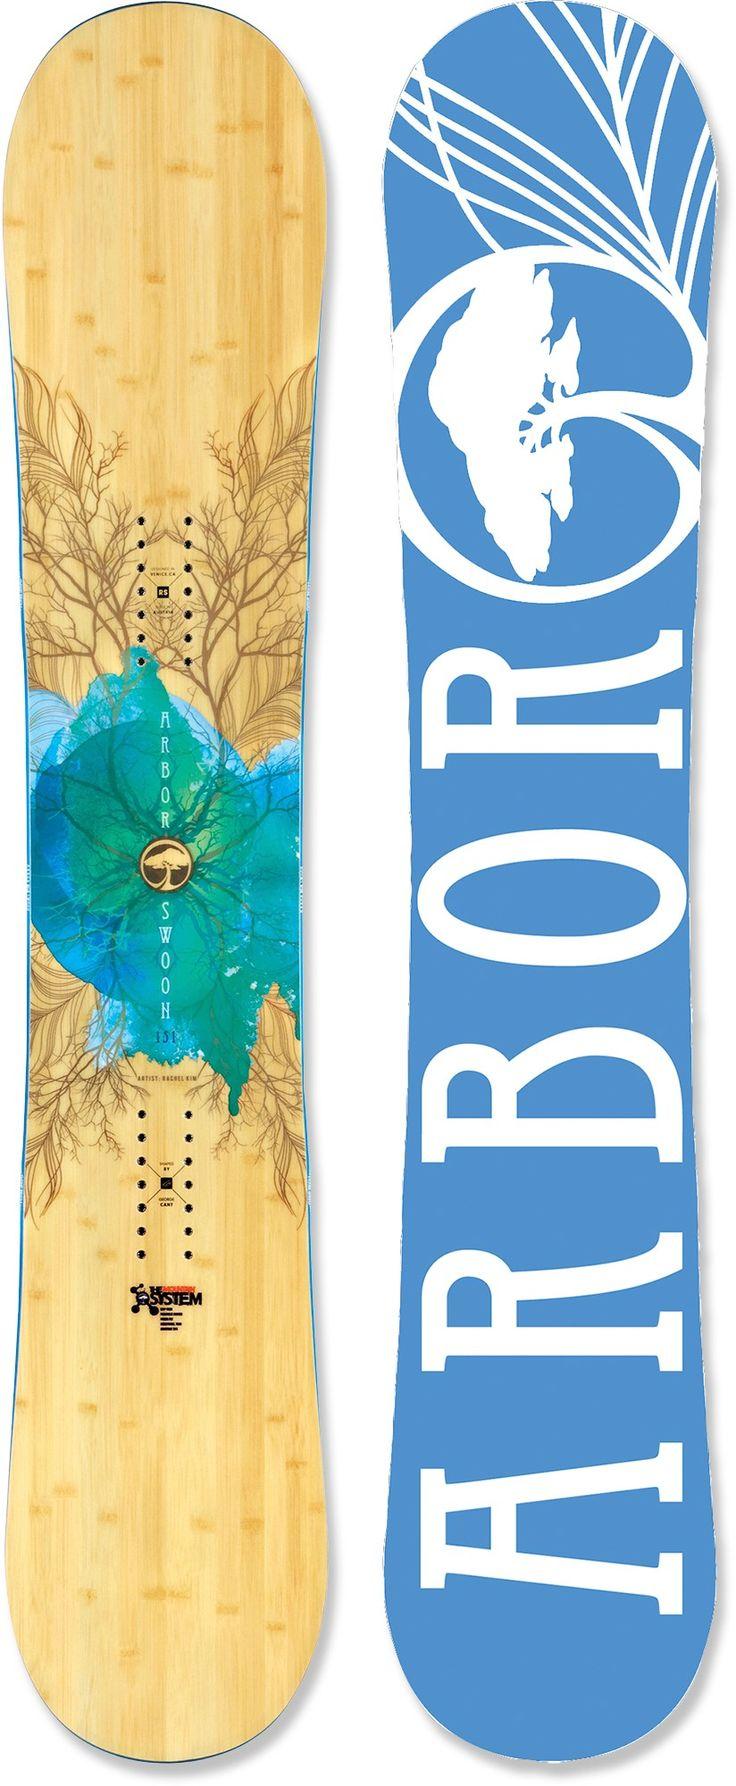 Arbor Swoon Snowboard - Women's - 2012/2013 at REI.com